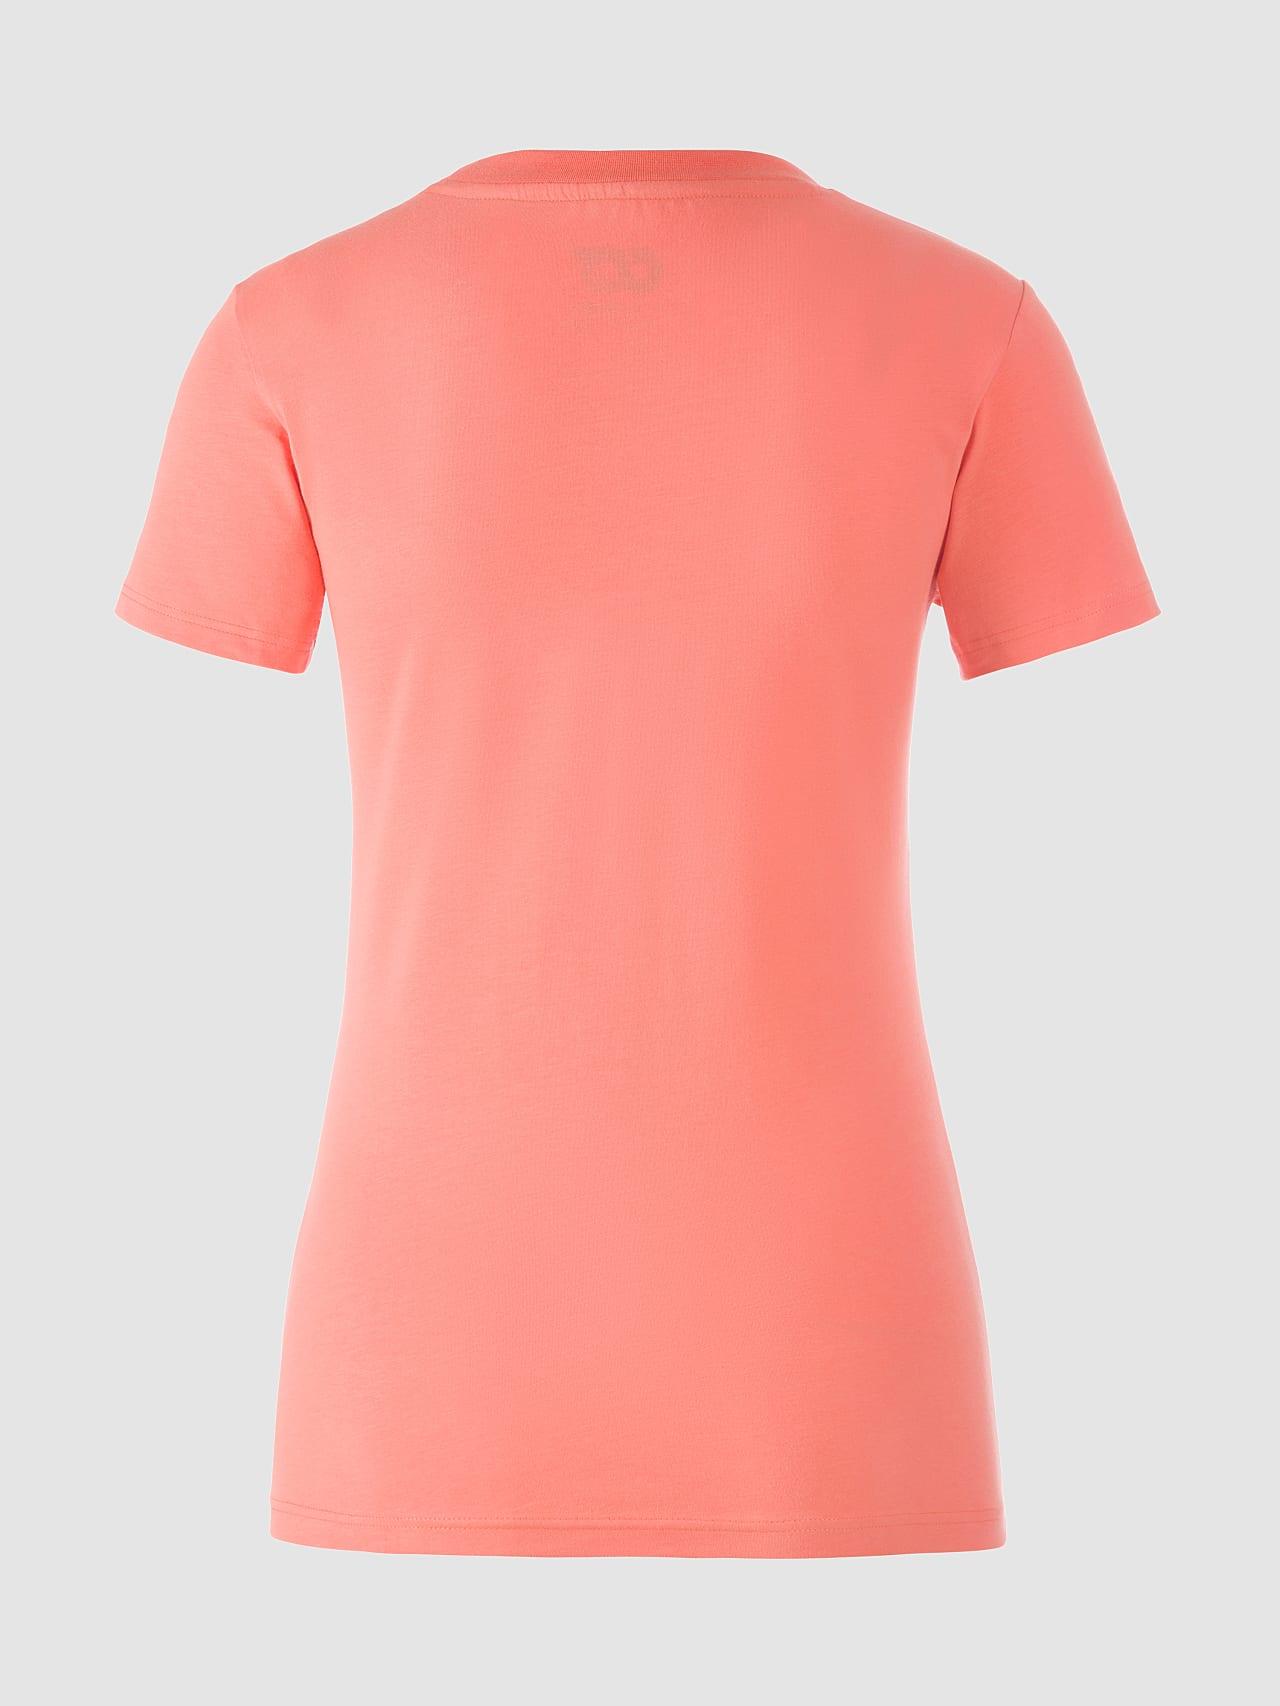 JALP V4.Y5.01 Cotton Logo T-Shirt coral Left Alpha Tauri